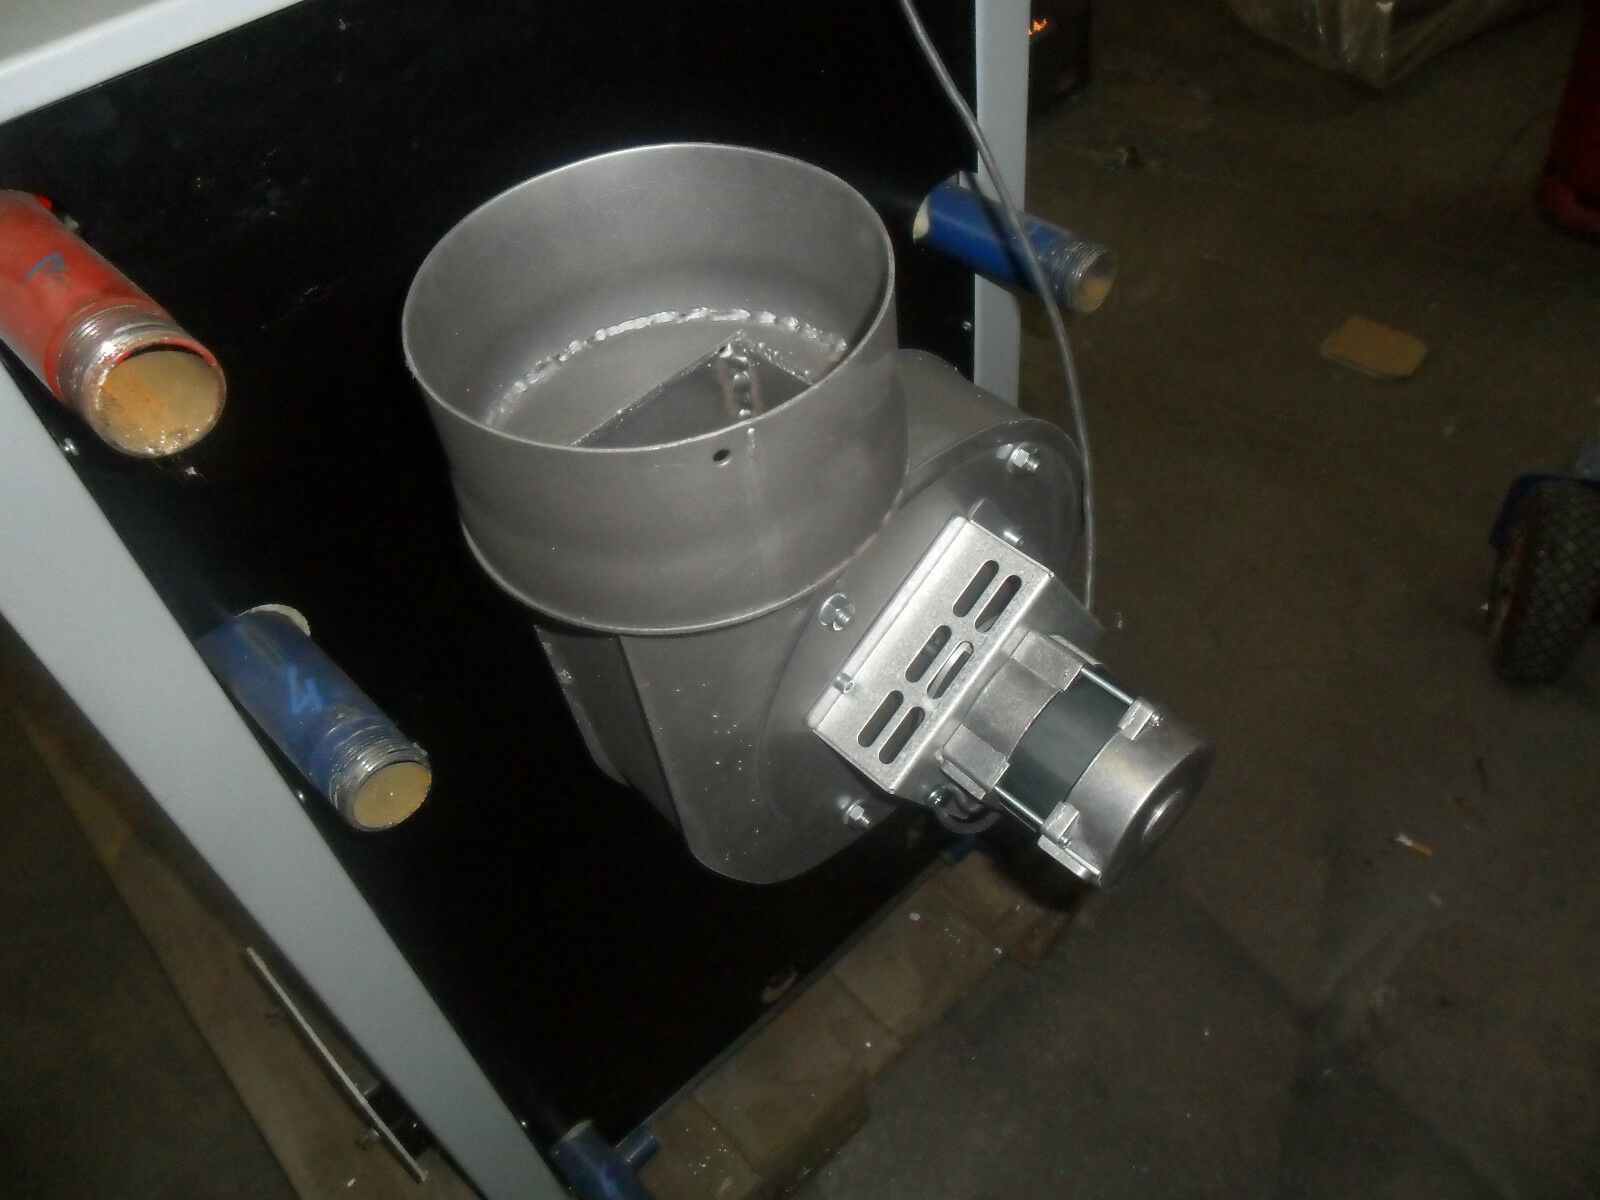 Abzugventilator, Abgasventilator, Rauchabzugventilator 160 mm Durchmesser